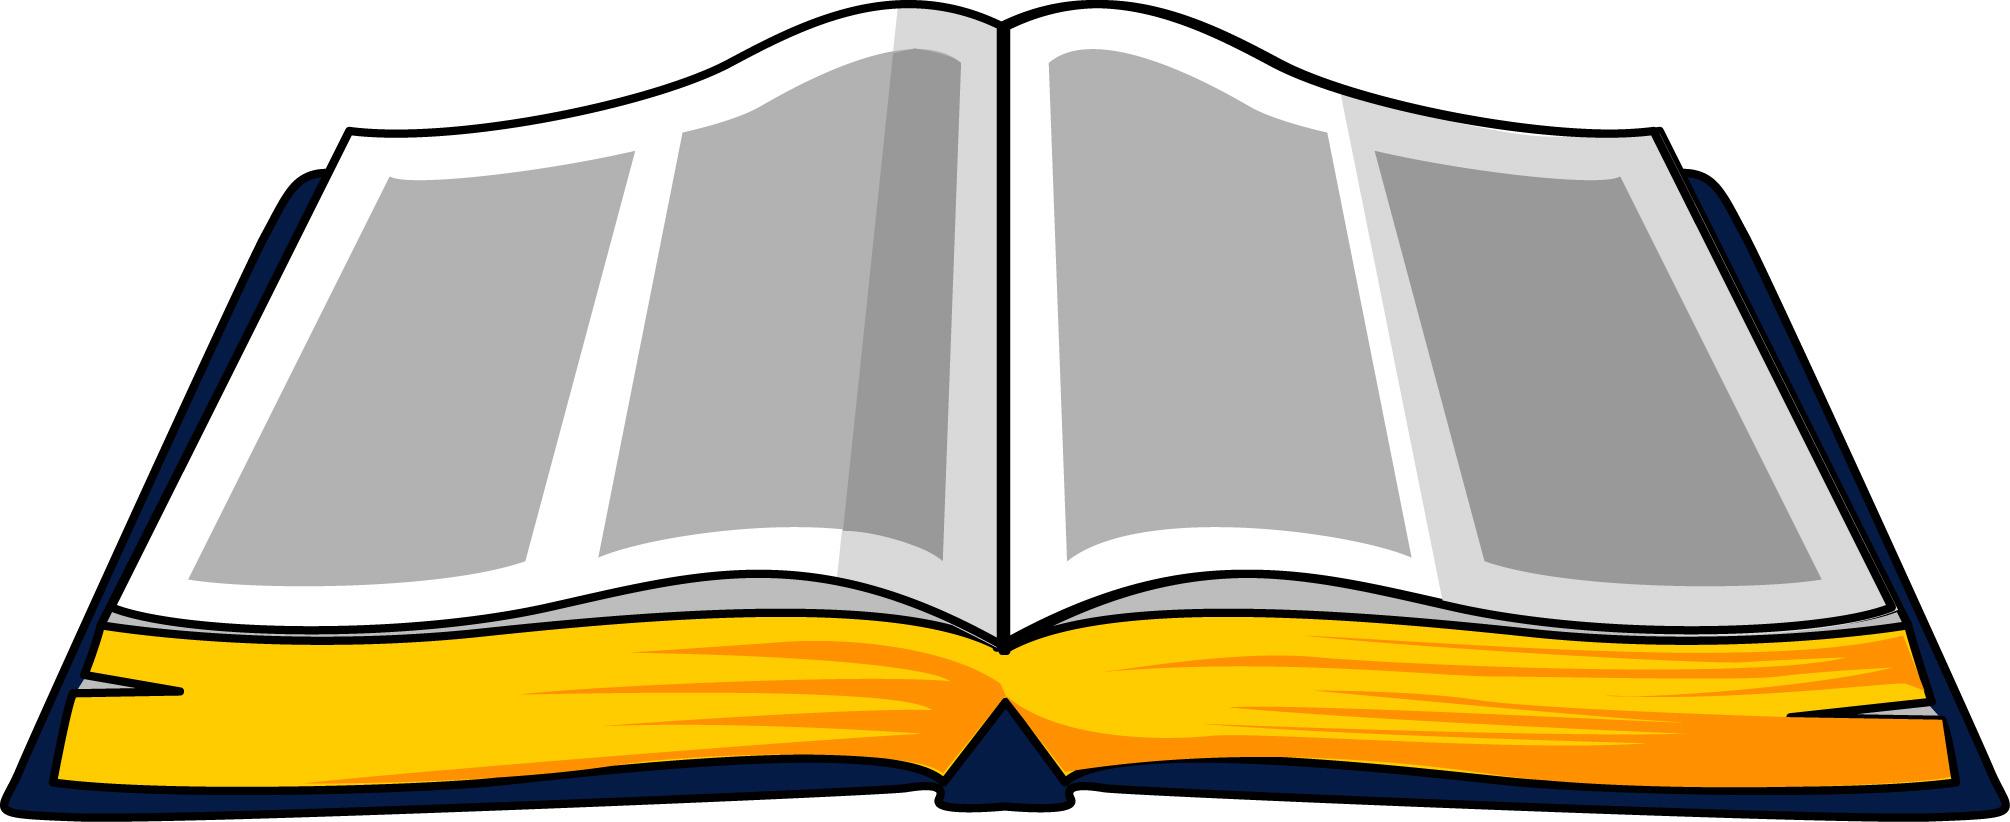 Clipart open bible png Open Bible Drawing | Free download best Open Bible Drawing on ... png